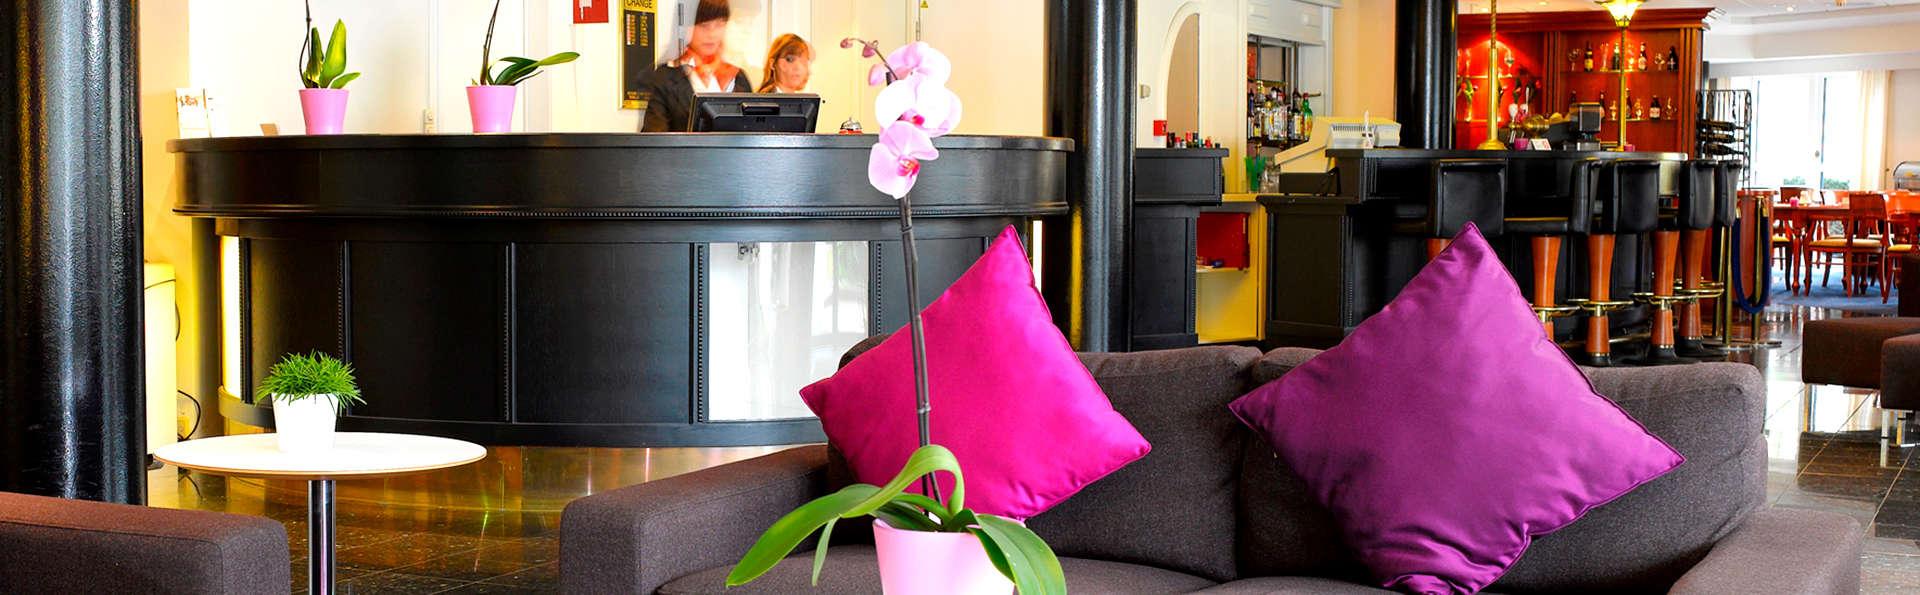 Thon Hotel Brussels Airport - Edit_Reception2.jpg